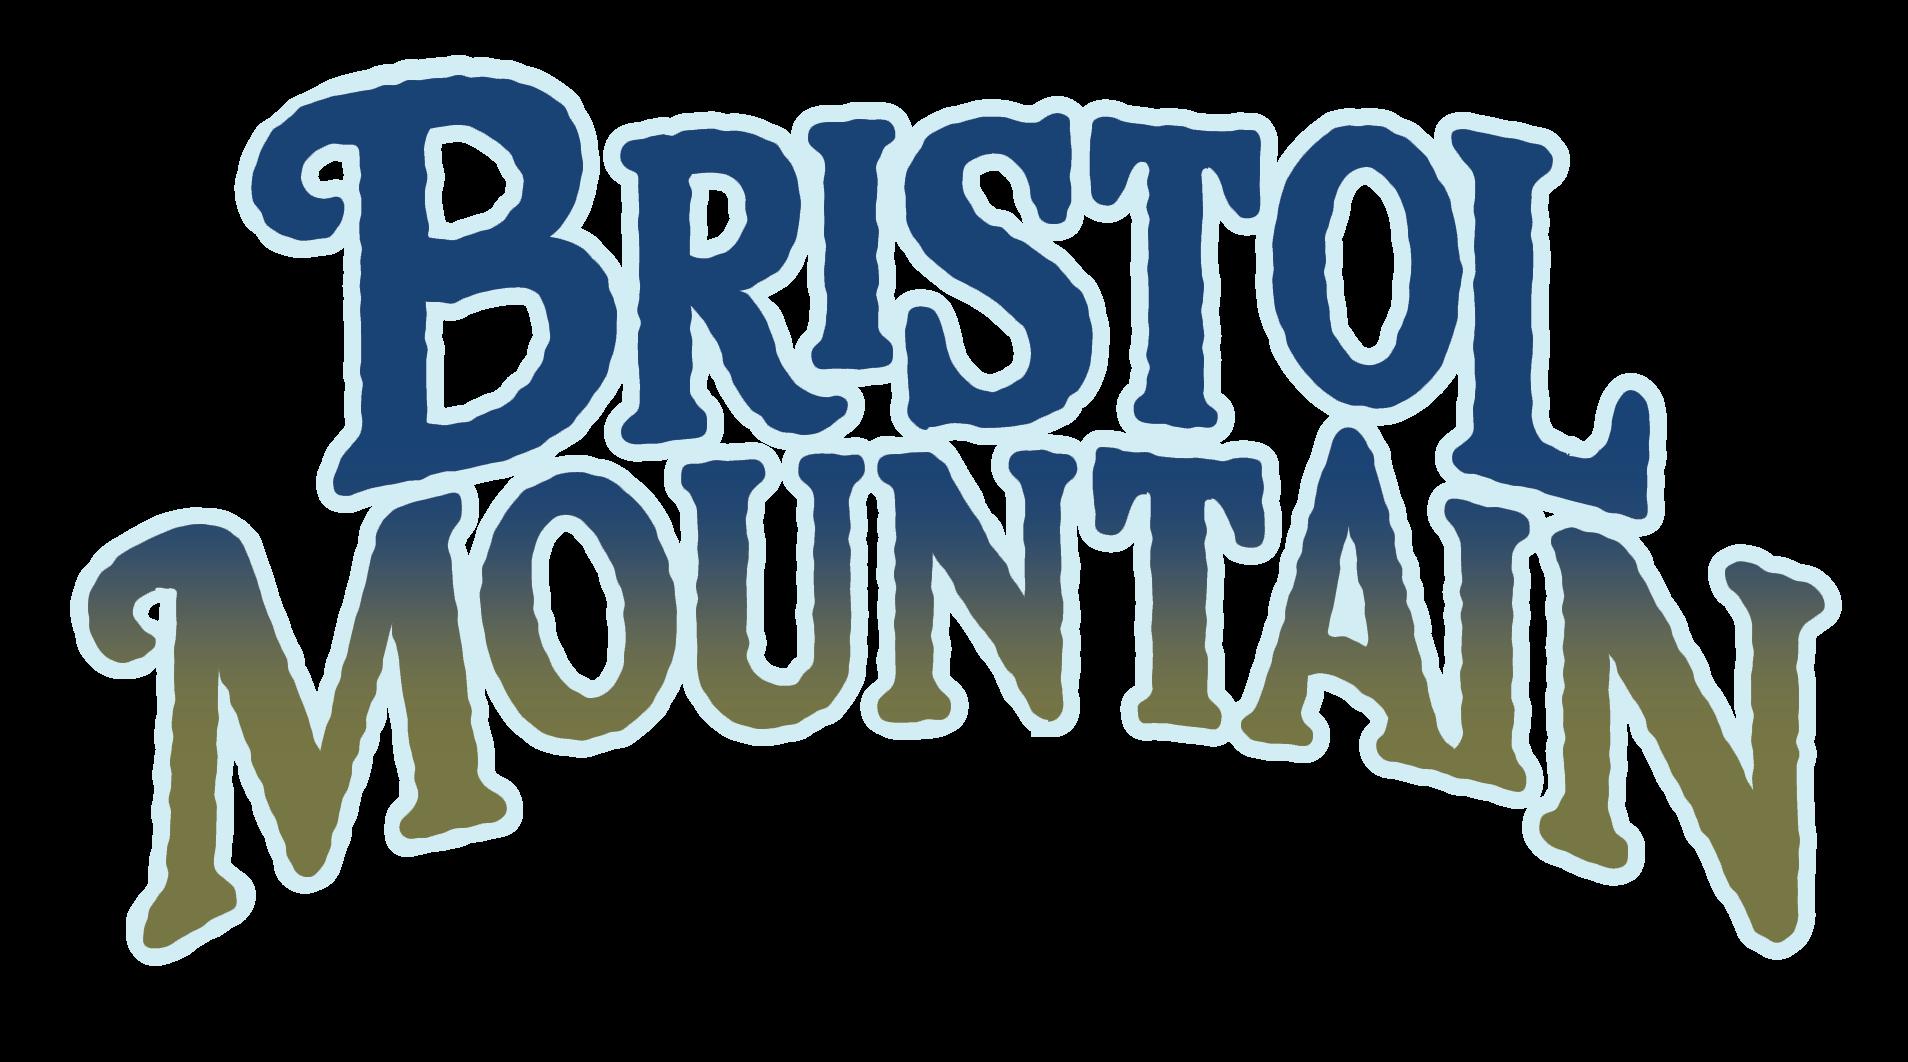 bristol mountain - new york ski & snowboard resort - canandaigua, ny